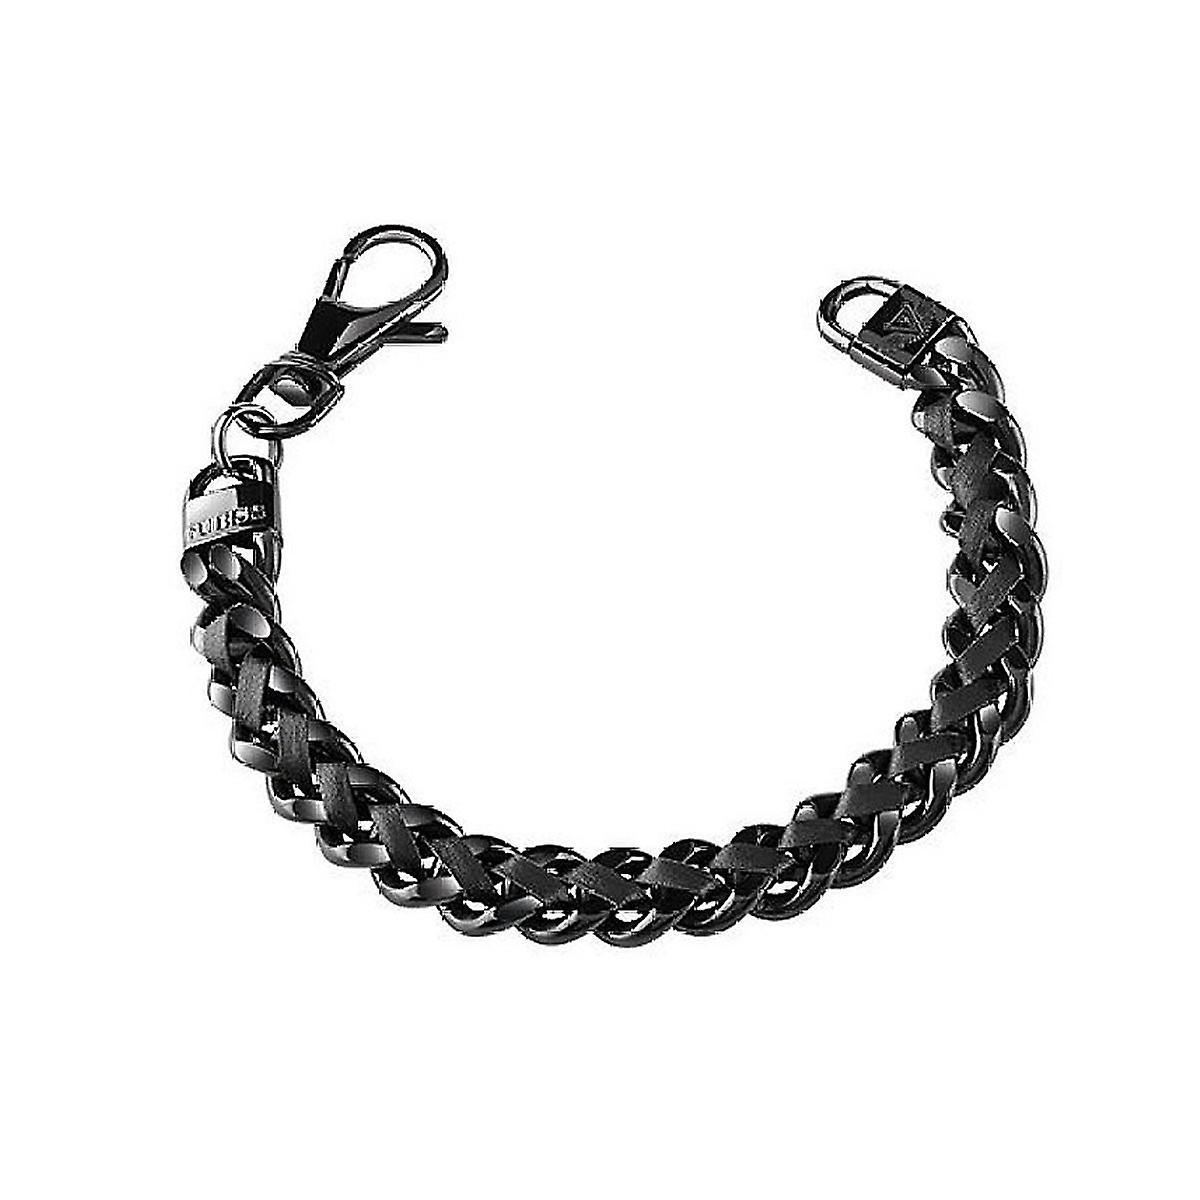 Guess Herren Armband Edelstahl Leder schwarz UMB21514-S